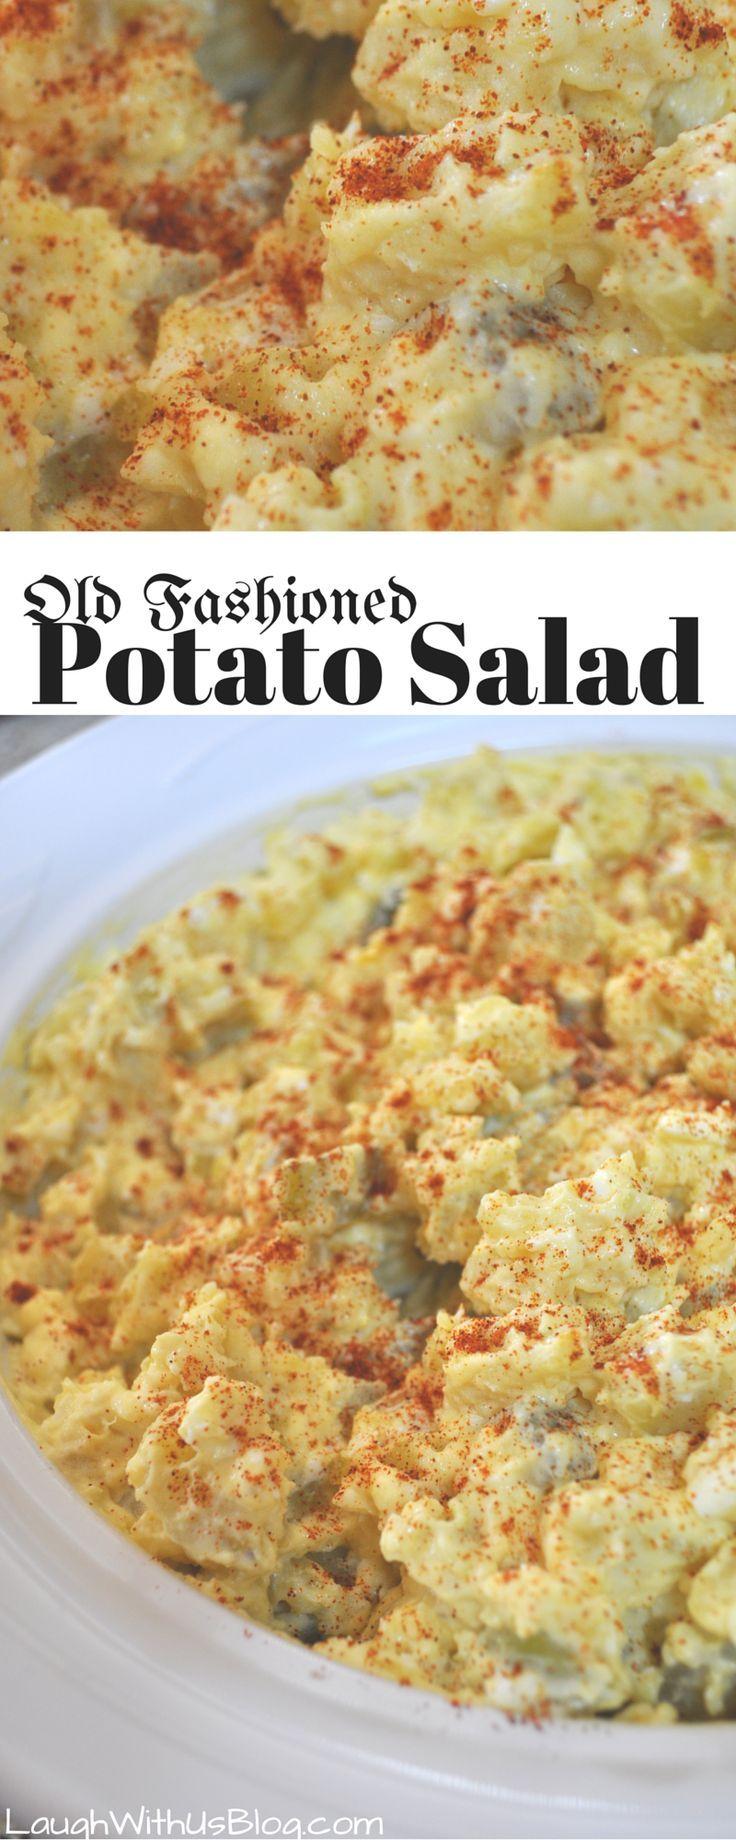 Old Fashioned Potato Salad-recipe passed down generations, so good Old Fashioned Potato Salad--recipe passed down generations, so good!